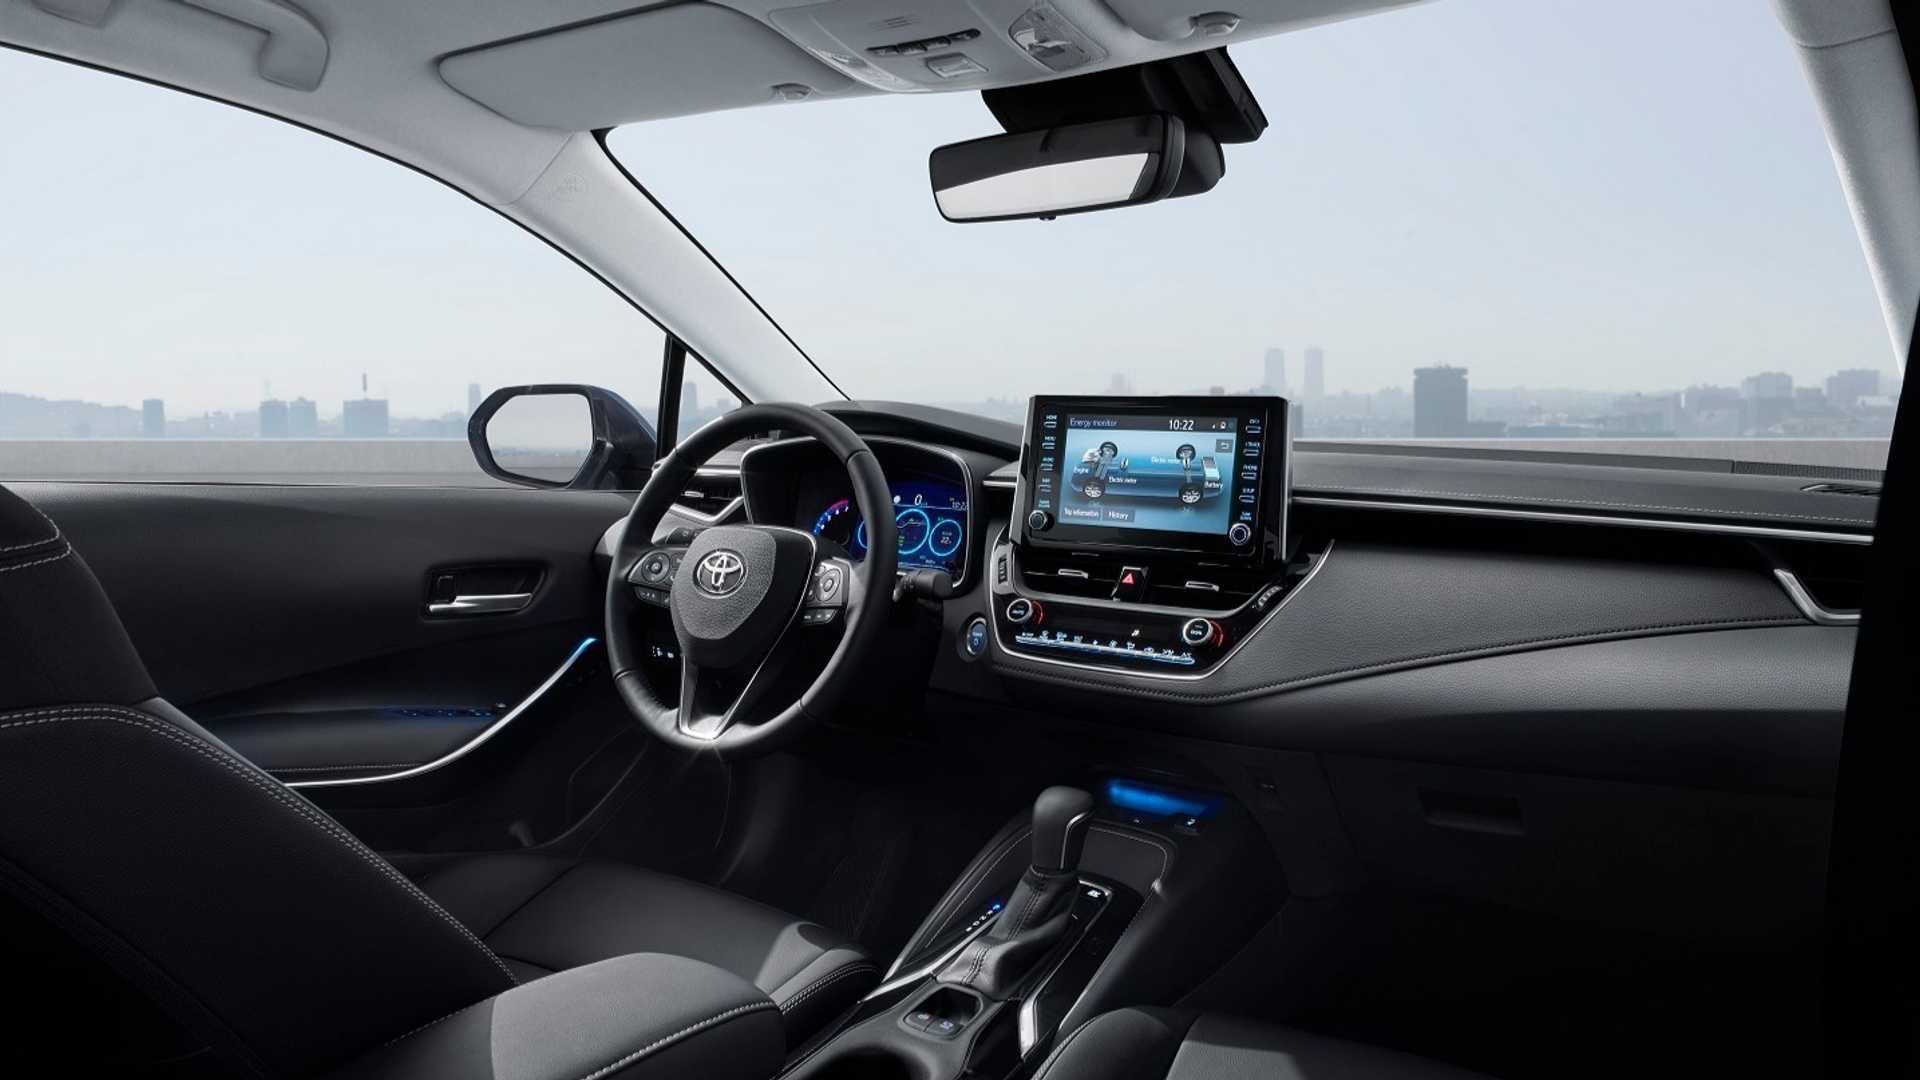 2019-toyota-corolla-hybrid-sedan (4)